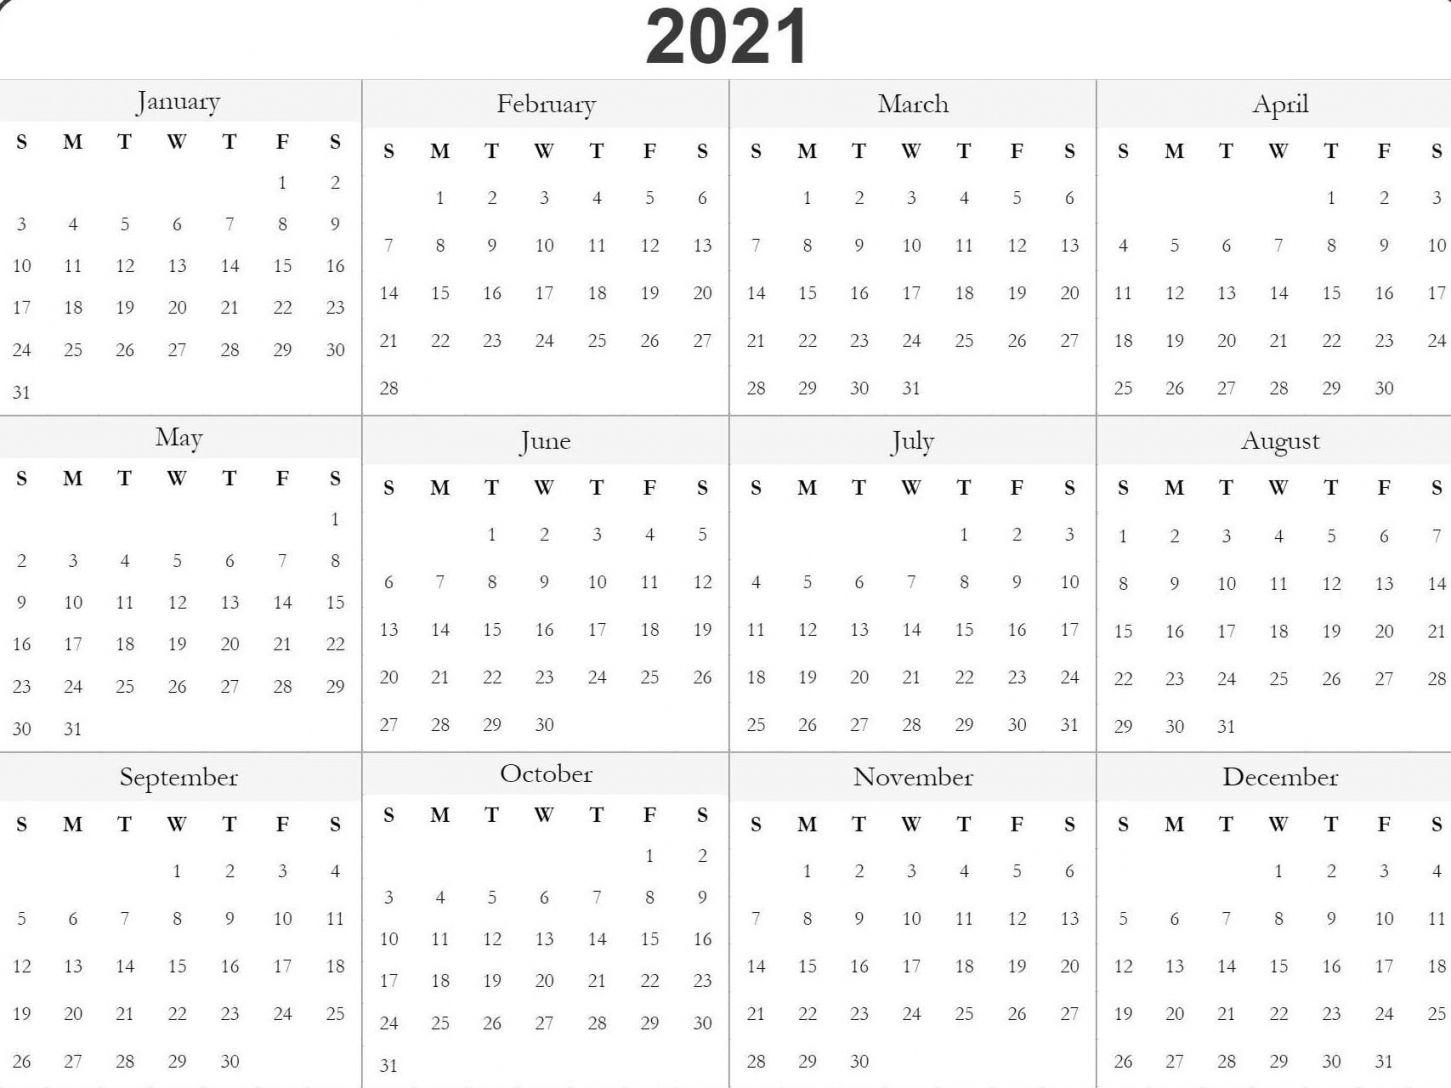 Printable 2021 Julian Date Calendar In 2021 | Print Calendar